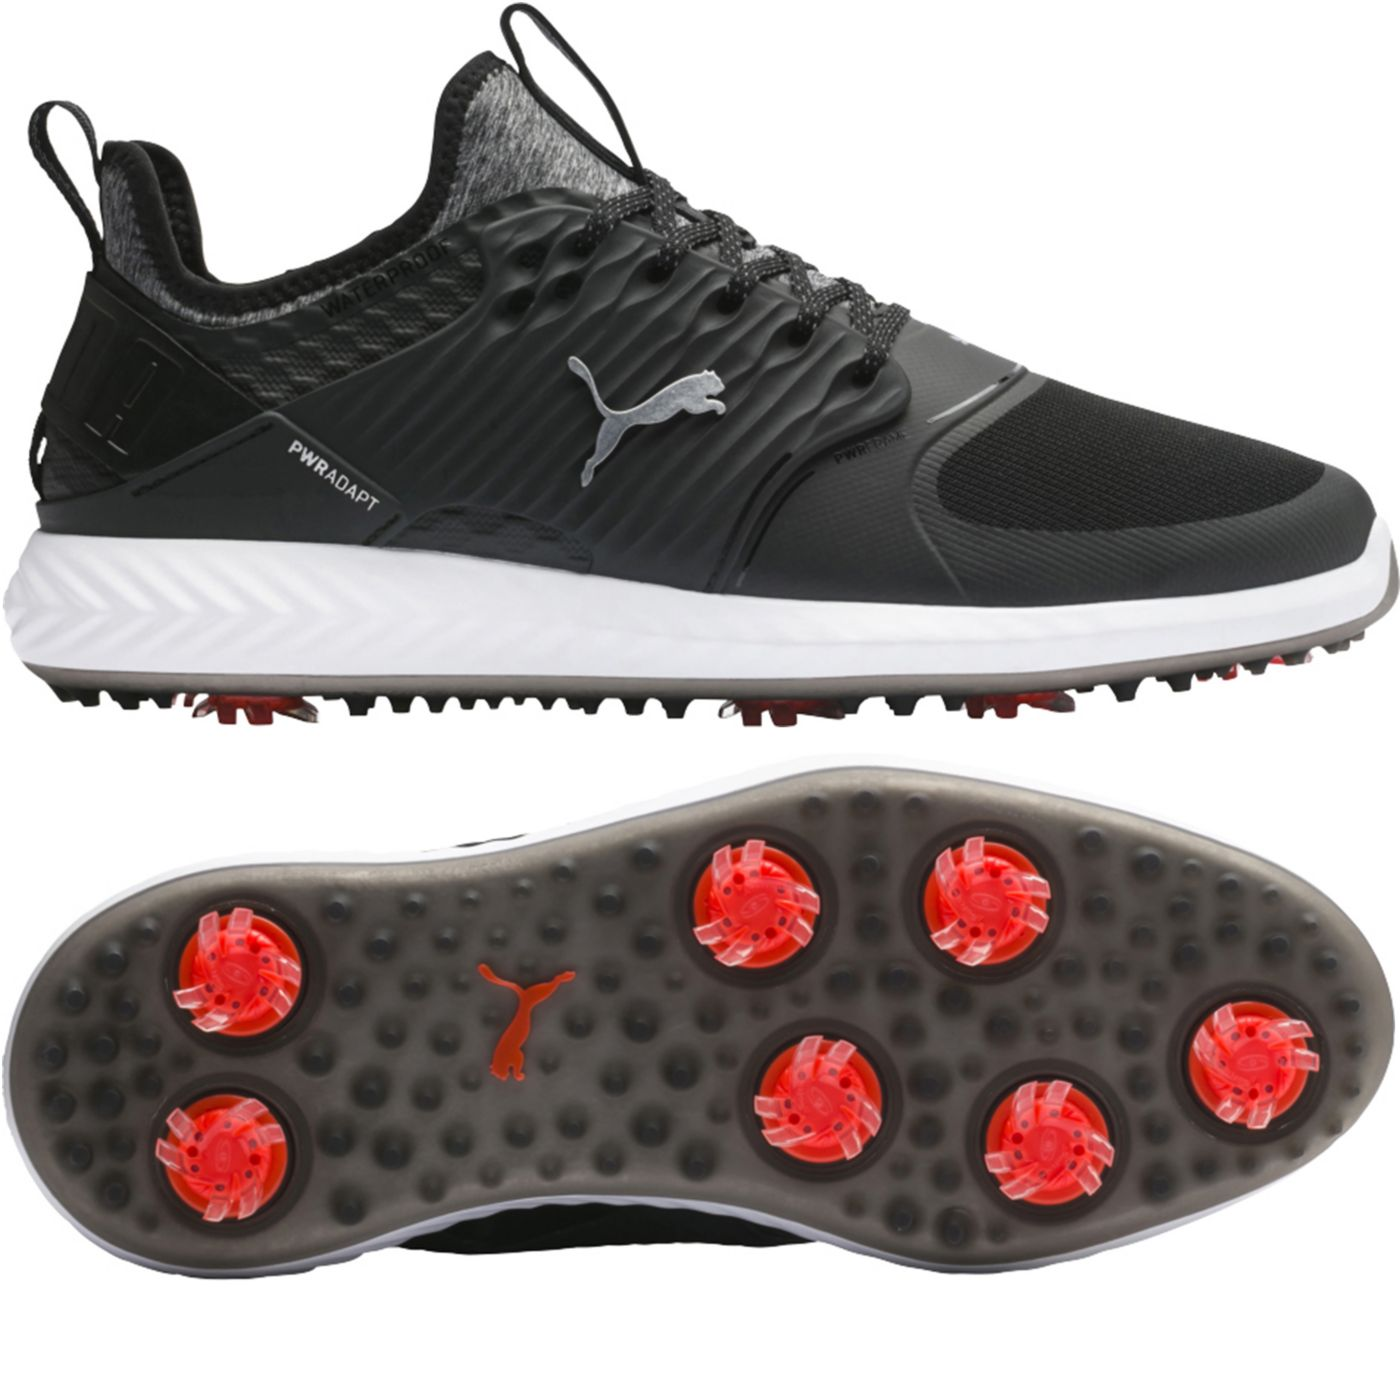 PUMA Men's IGNITE PWRADAPT Caged Golf Shoes